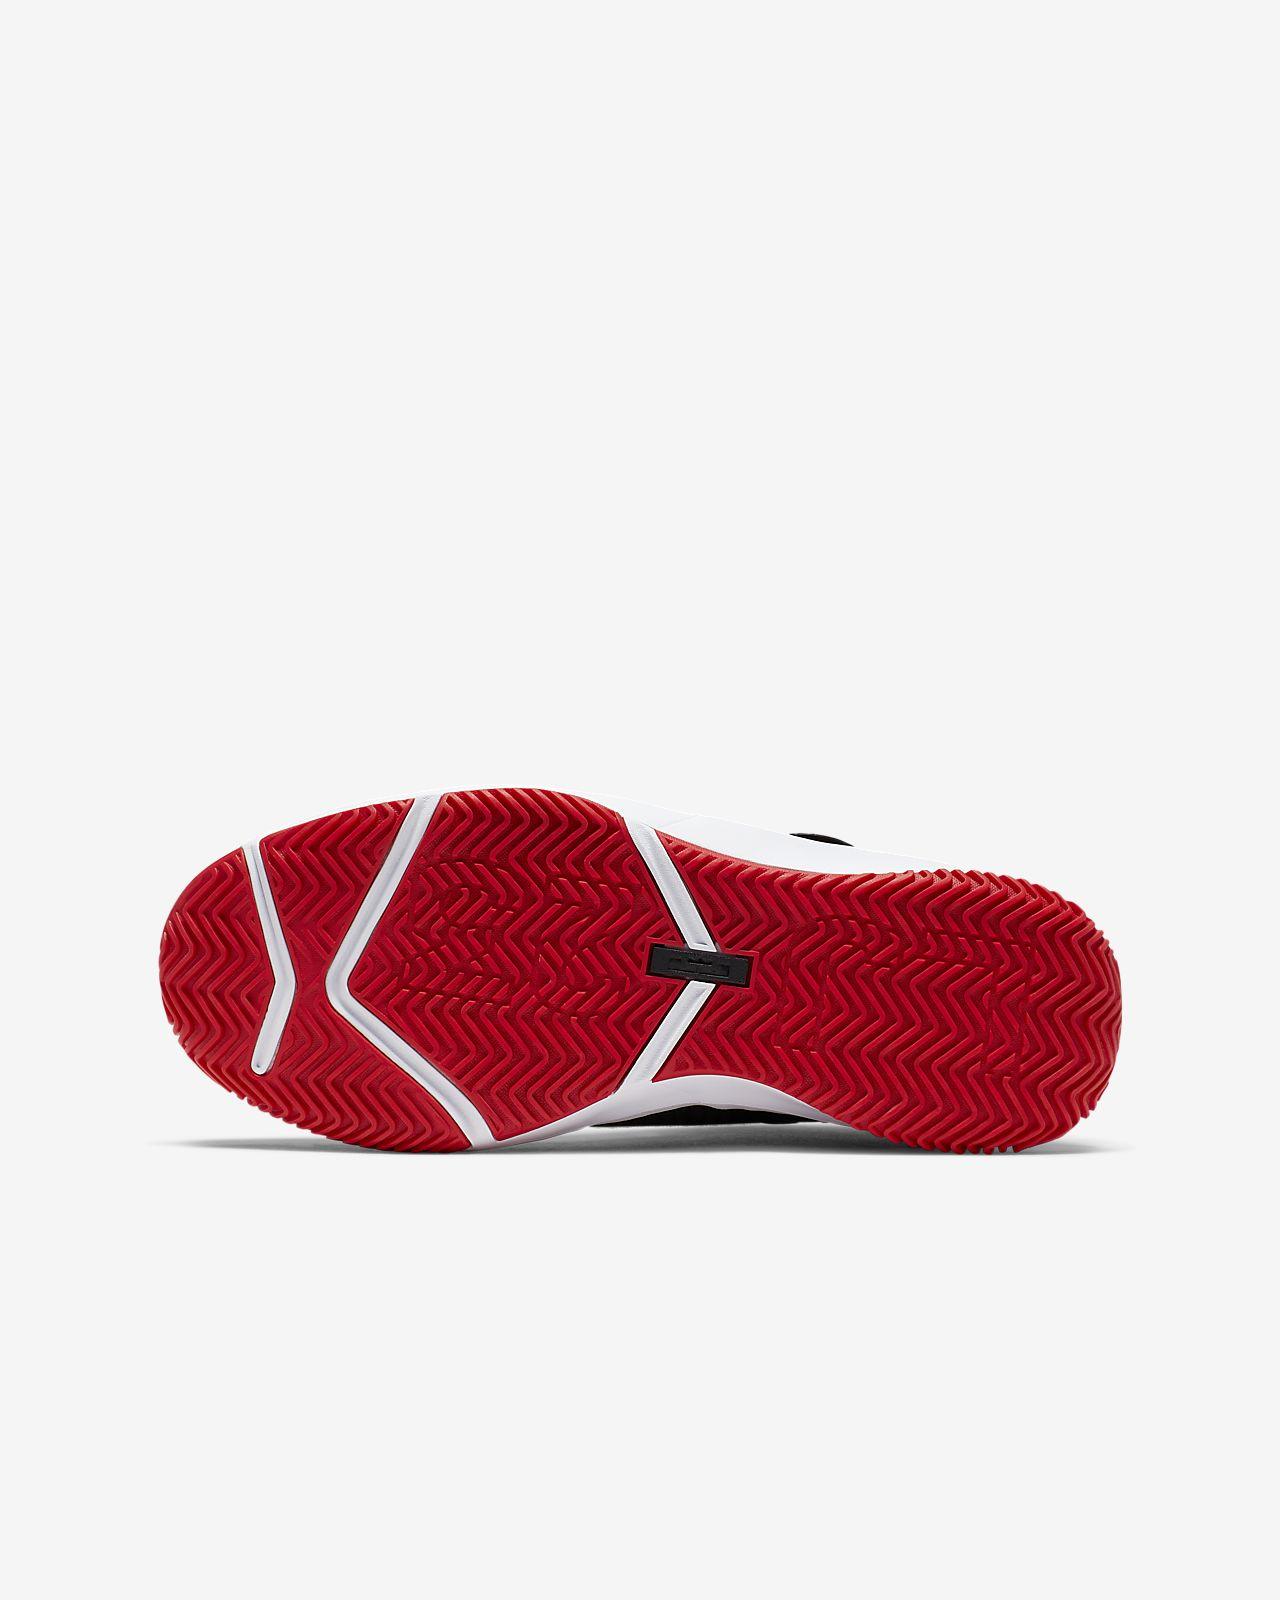 08bf4c8552737 LeBron Soldier 13 Flyease Big Kids' Basketball Shoe. Nike.com